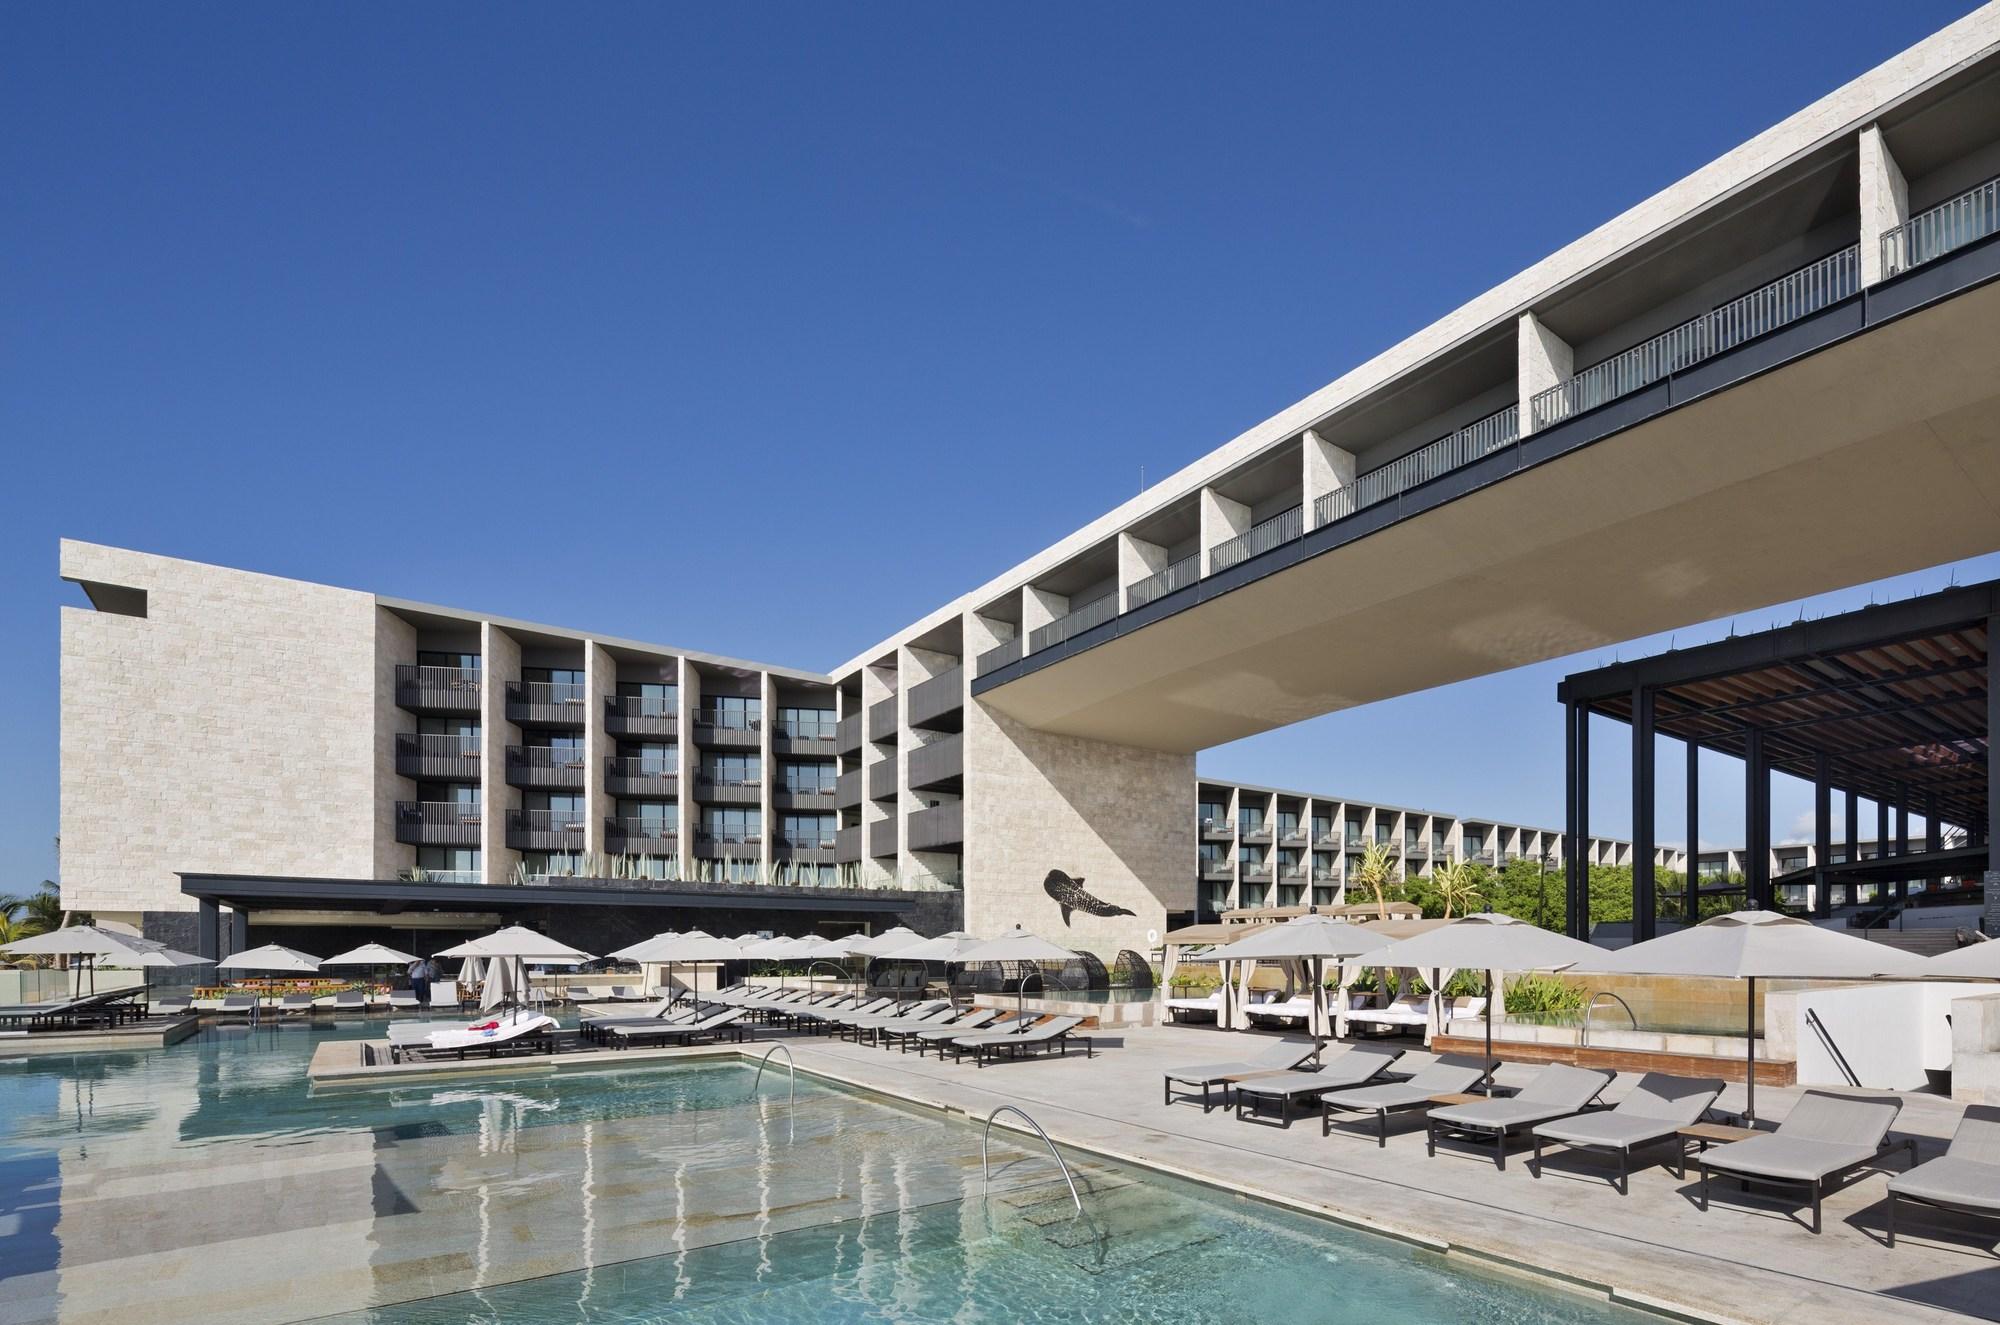 Hotel grand hyatt playa del carmen sordo madaleno for Arquitectura y diseno de hoteles